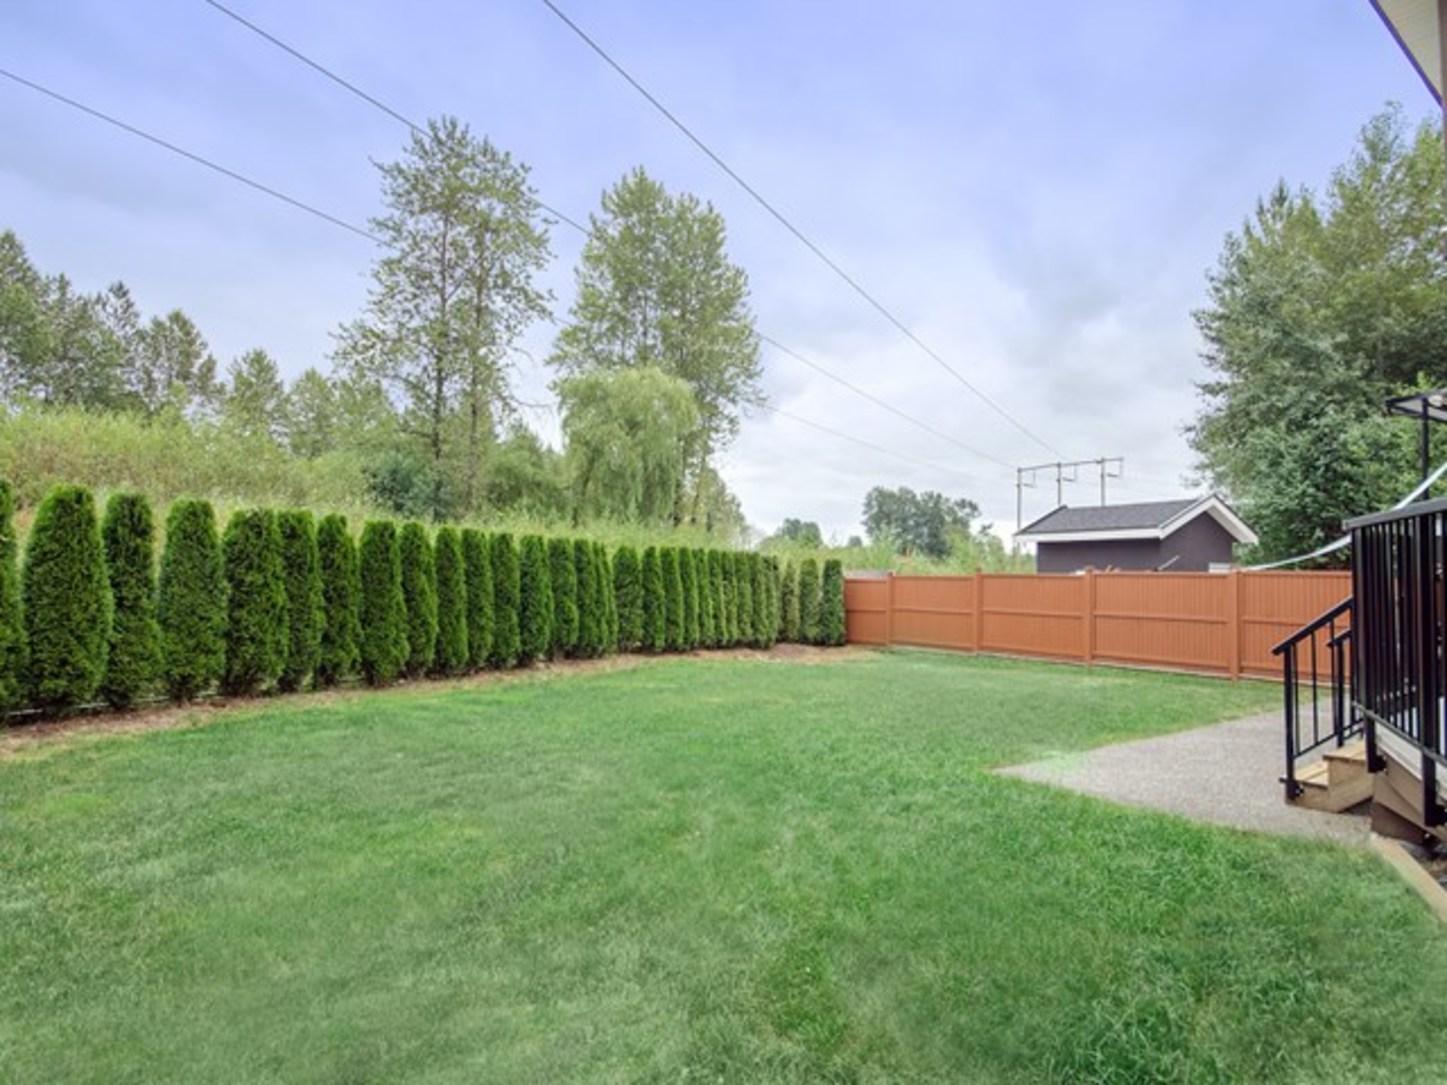 backyard at 4050 Joseph Place, Burke Mountain, Coquitlam